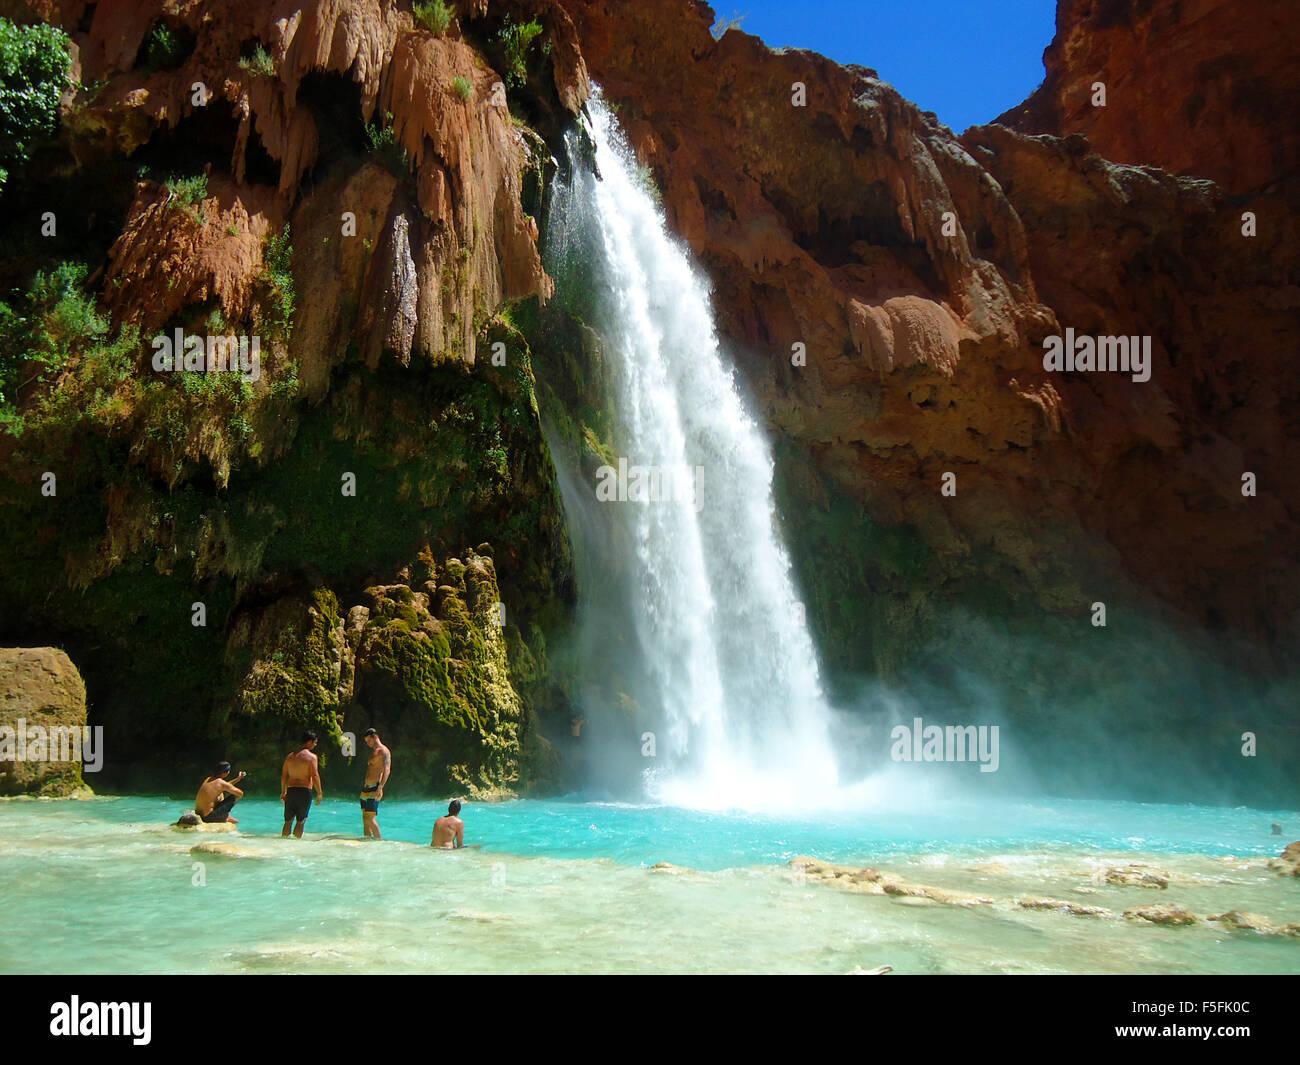 Majestic Waterfalls And Beautiful Scenery On The Havasupai Indian Reservation In Grand Canyon Arizona USA